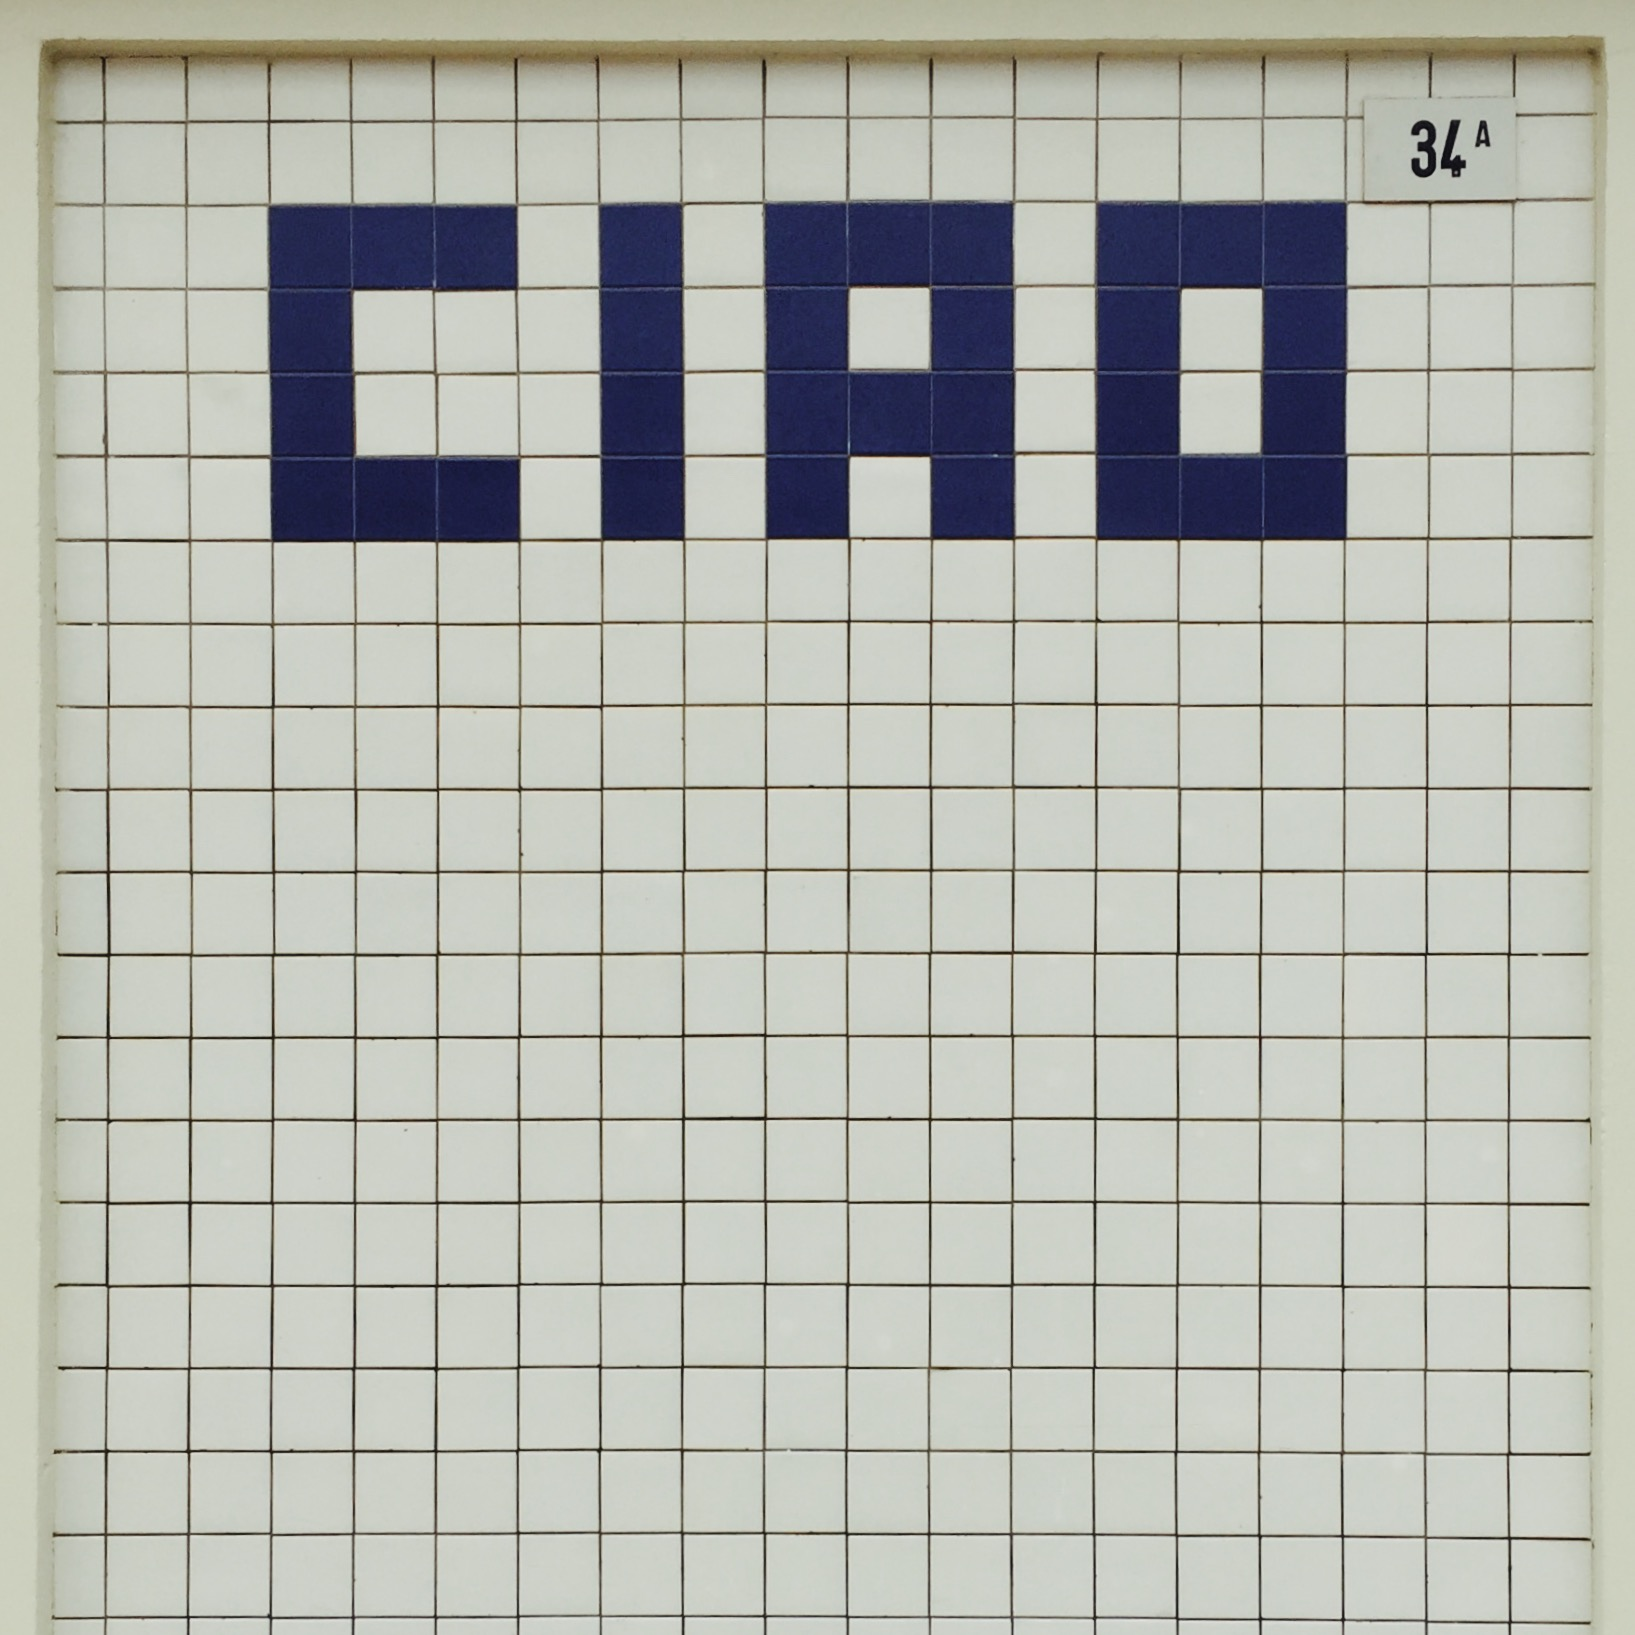 CED6B208-3C1B-48C2-B335-8E4F045F24BA.JPG